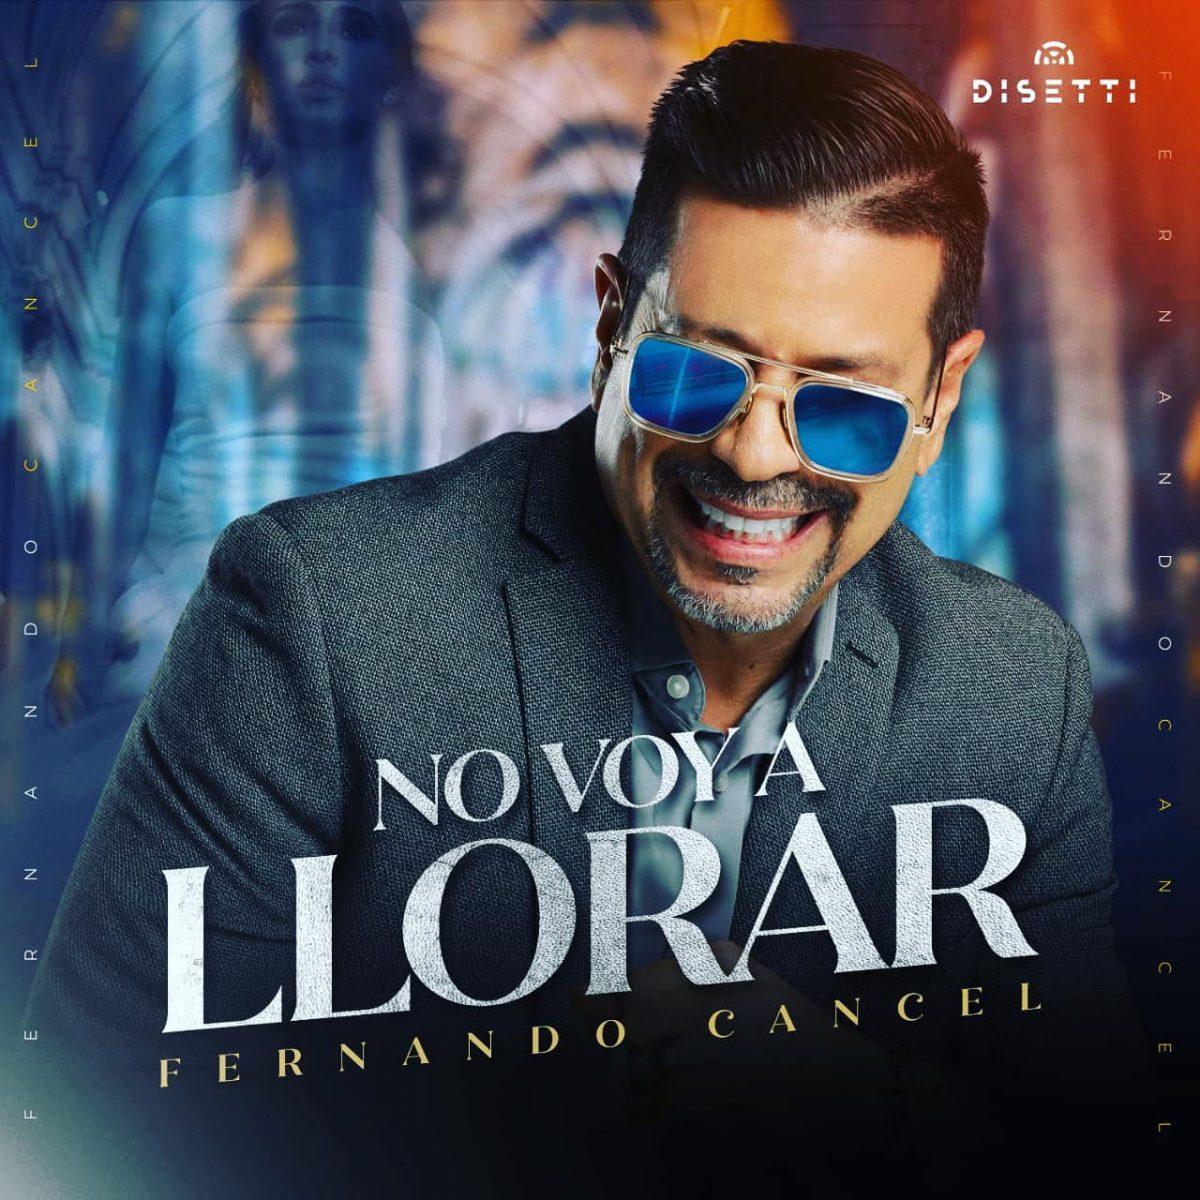 NO VOY A LLORAR – Fernando Cancel